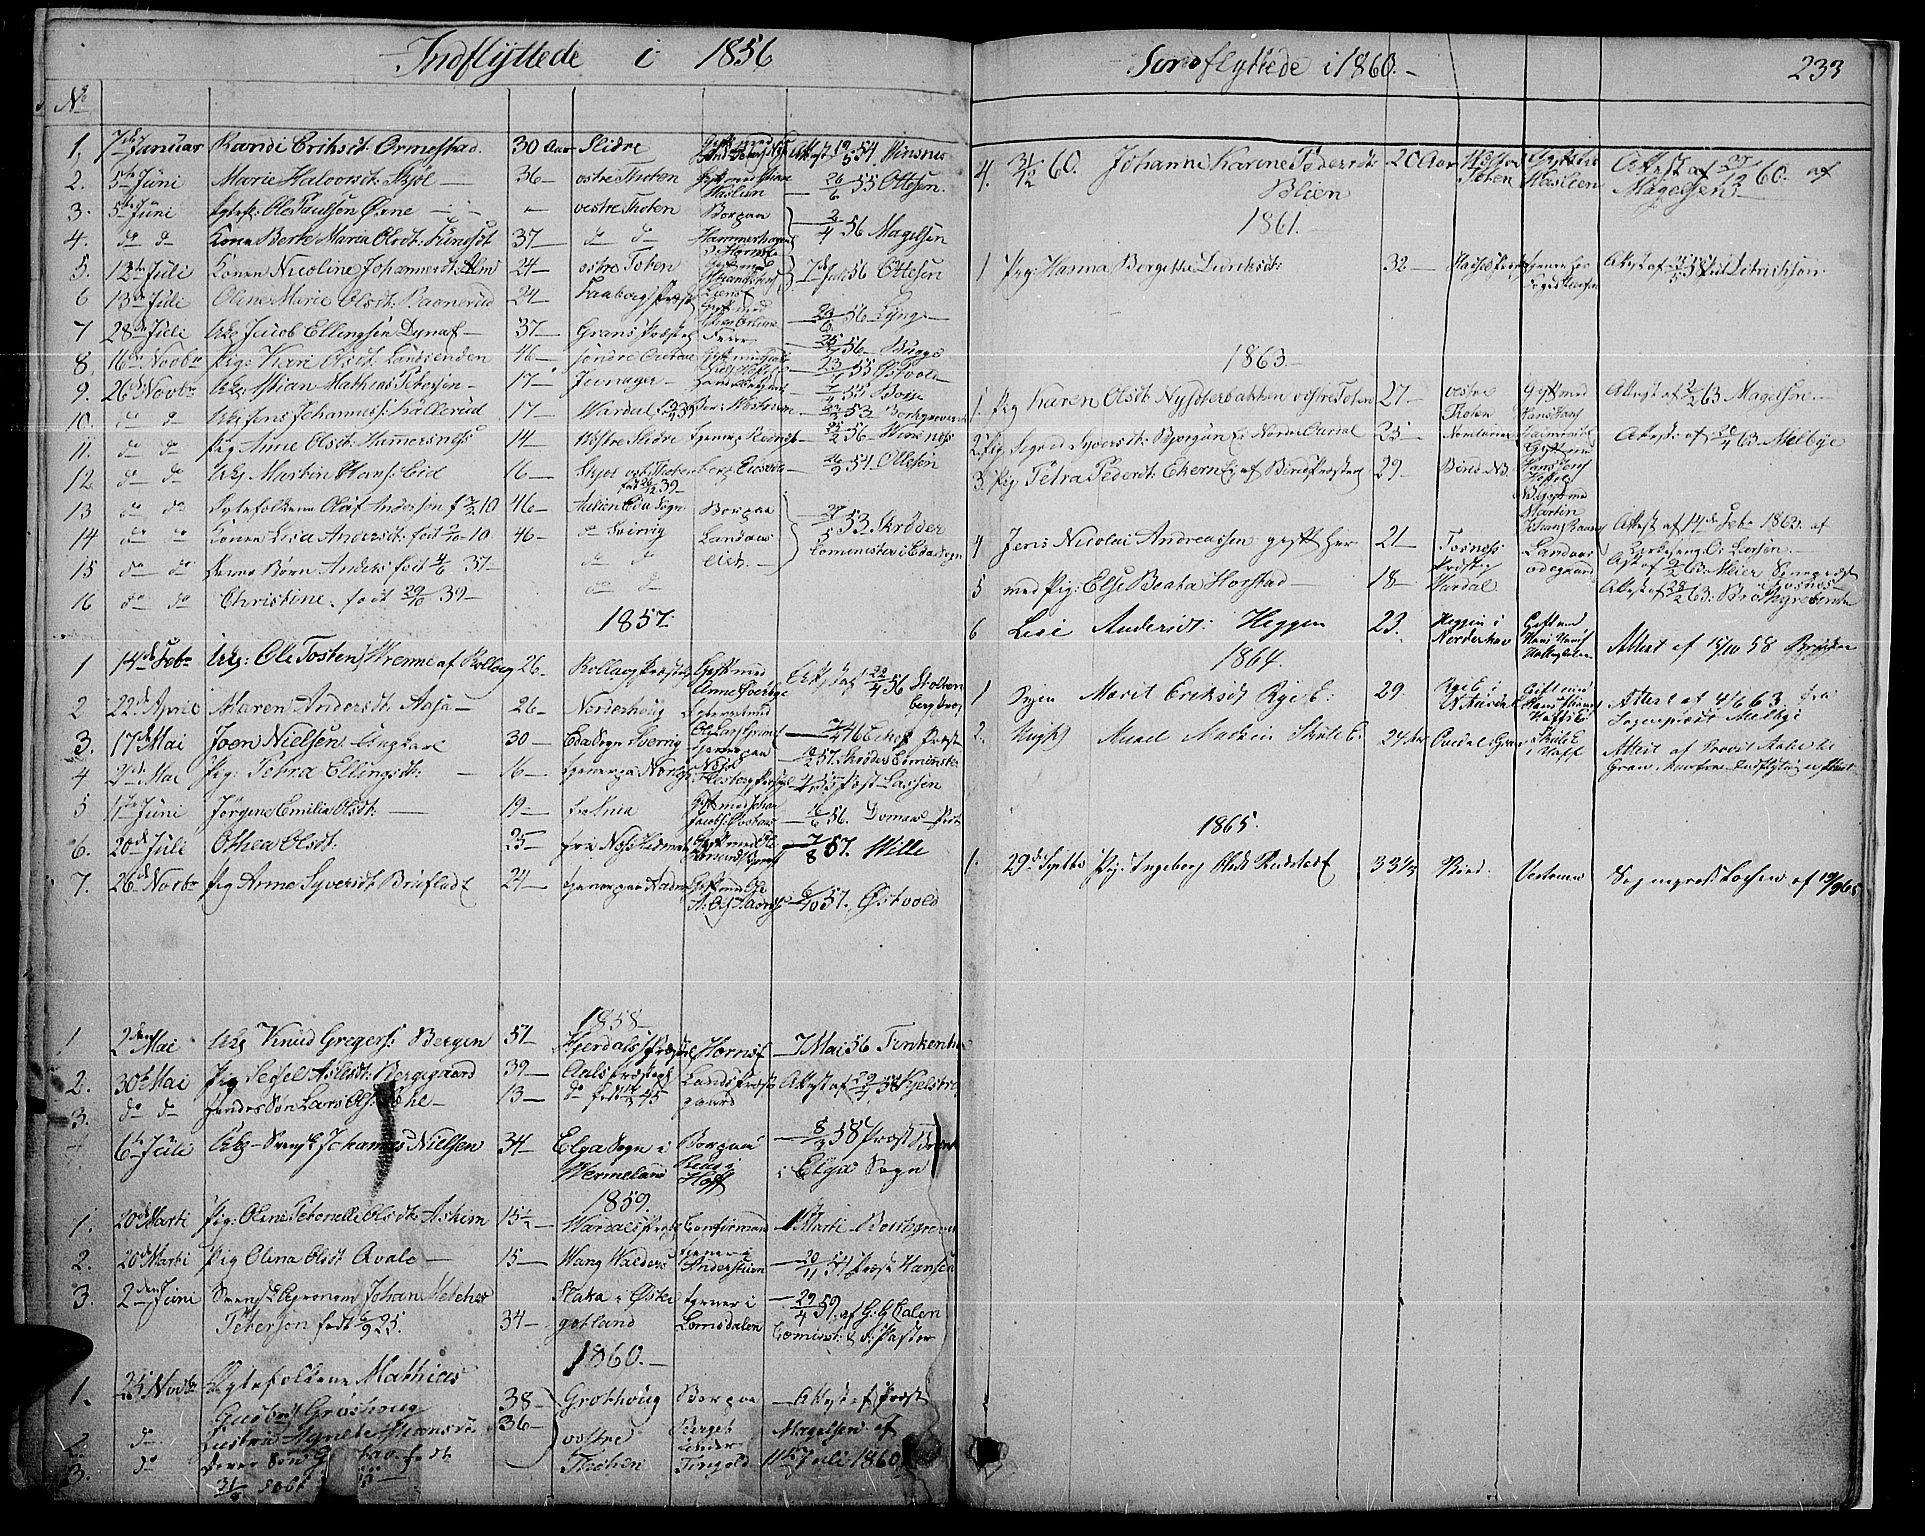 SAH, Søndre Land prestekontor, L/L0001: Klokkerbok nr. 1, 1849-1883, s. 233